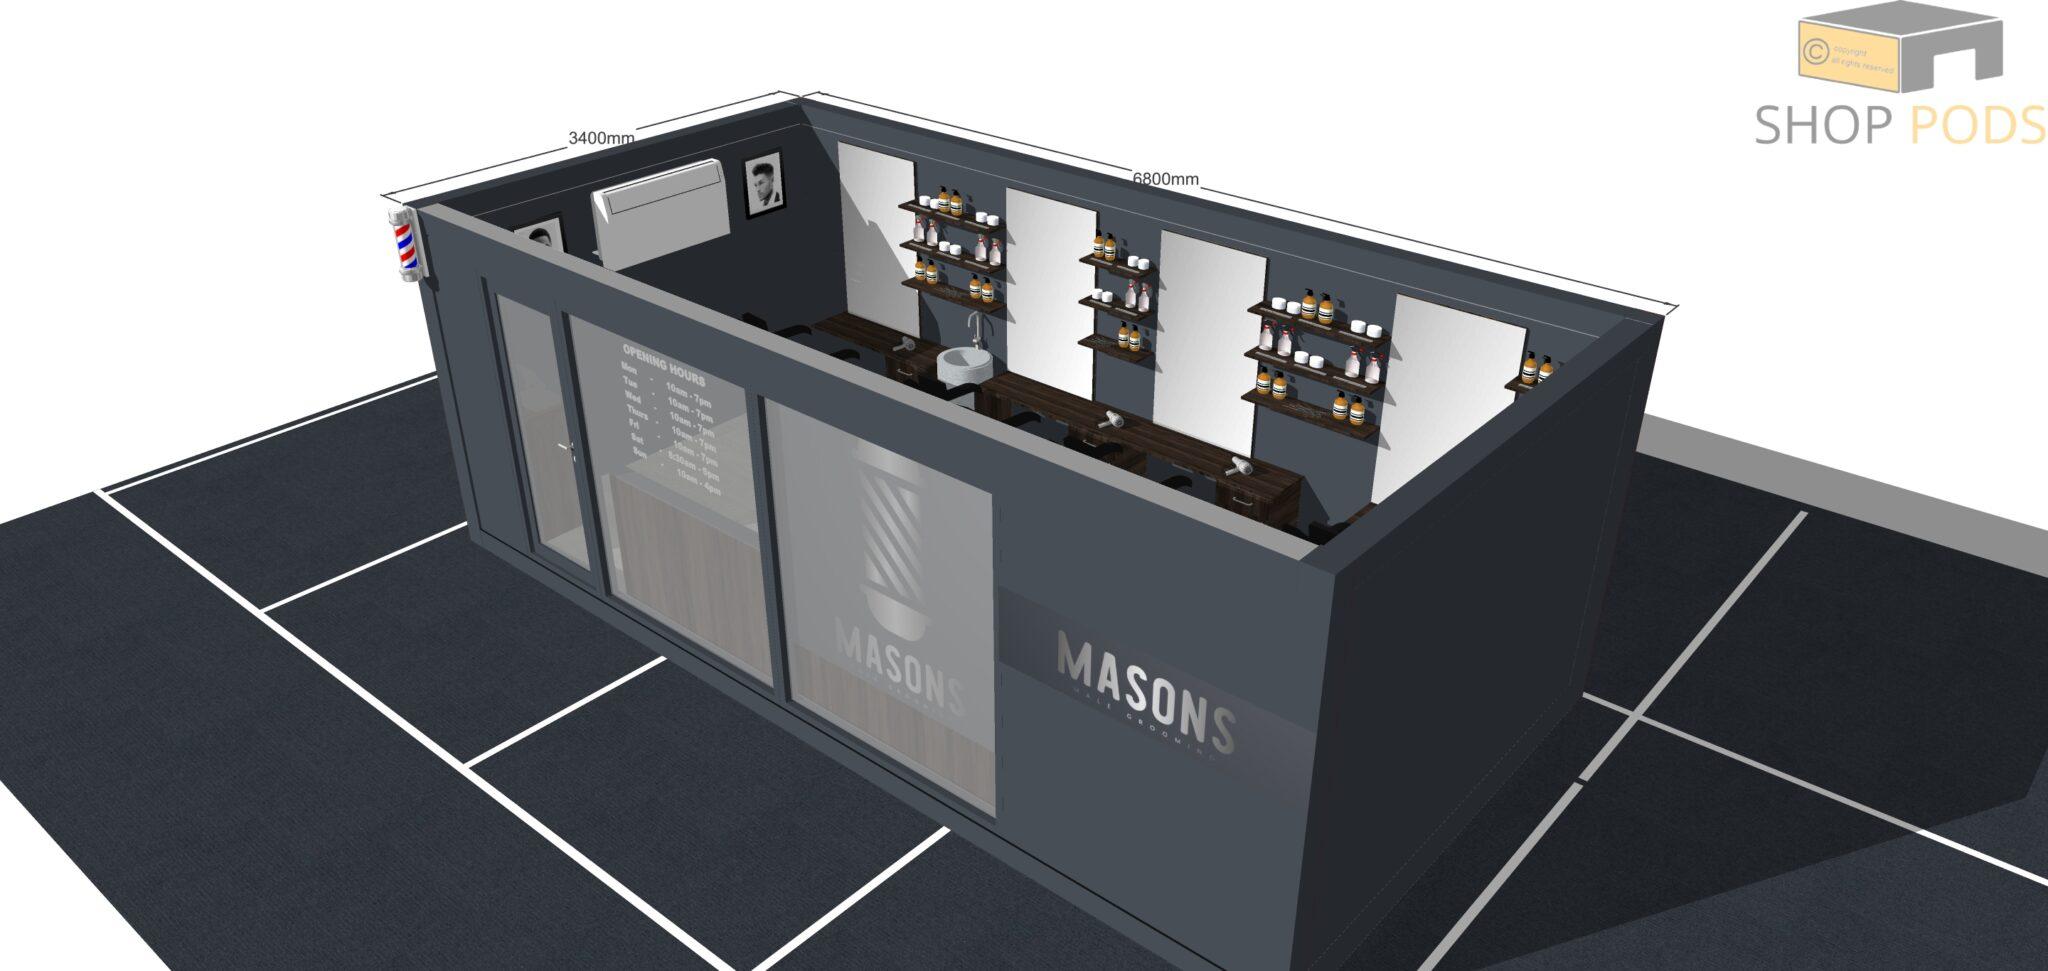 Mason - 6.8m x 3.4m POD0